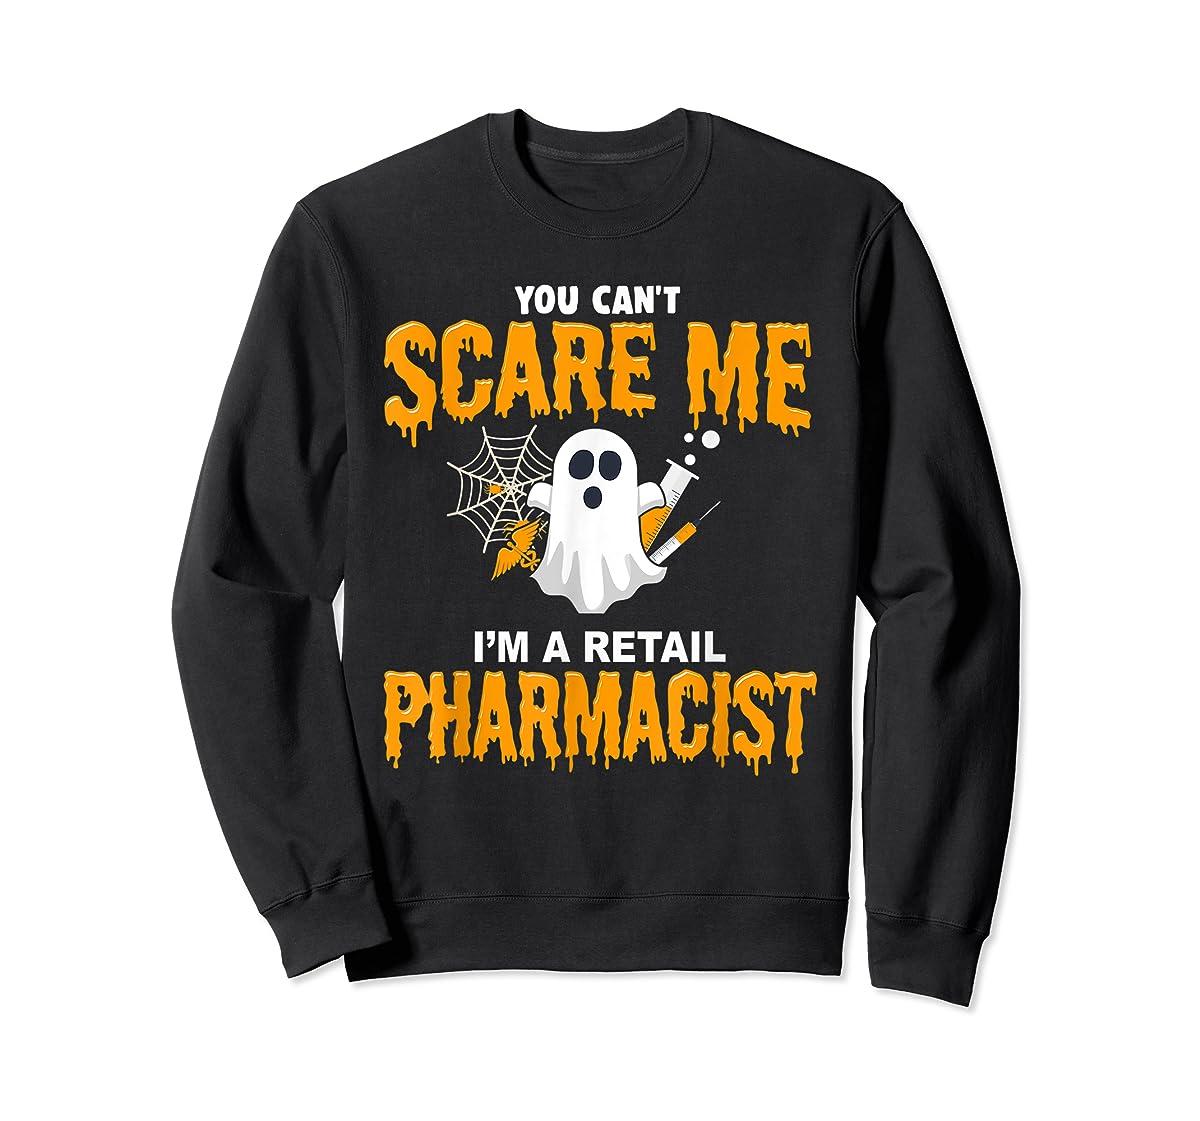 Halloween Costume Shirt I'm A Retail Pharmacist  T-Shirt-Sweatshirt-Black